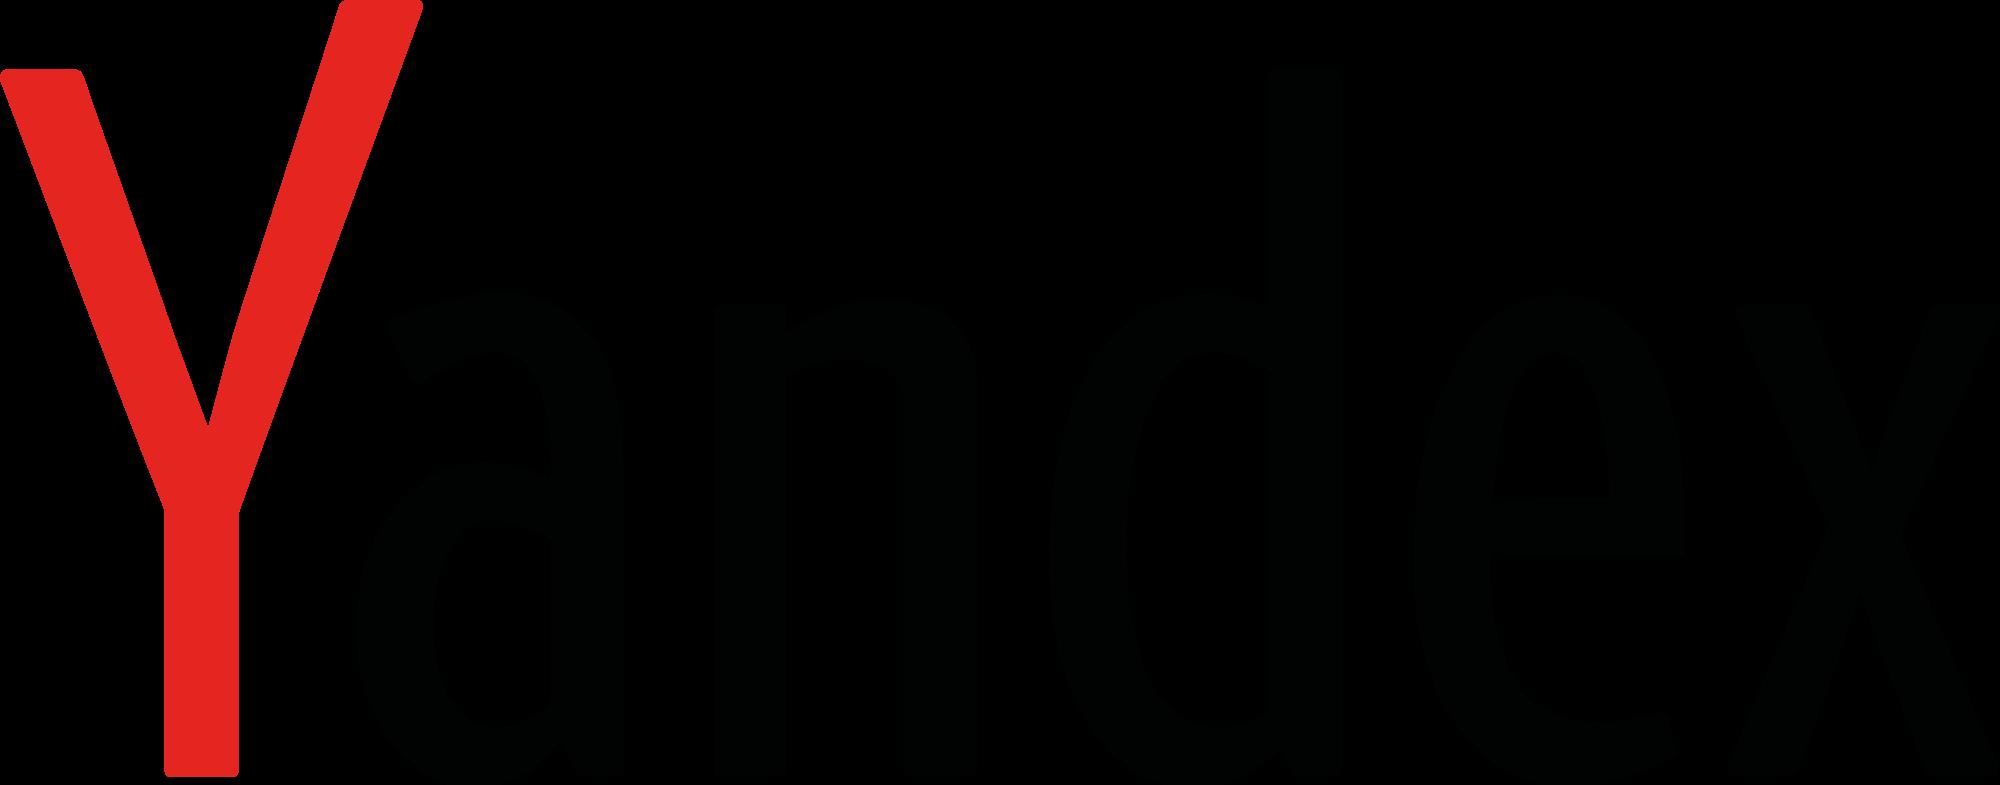 Yandex - Logos Download